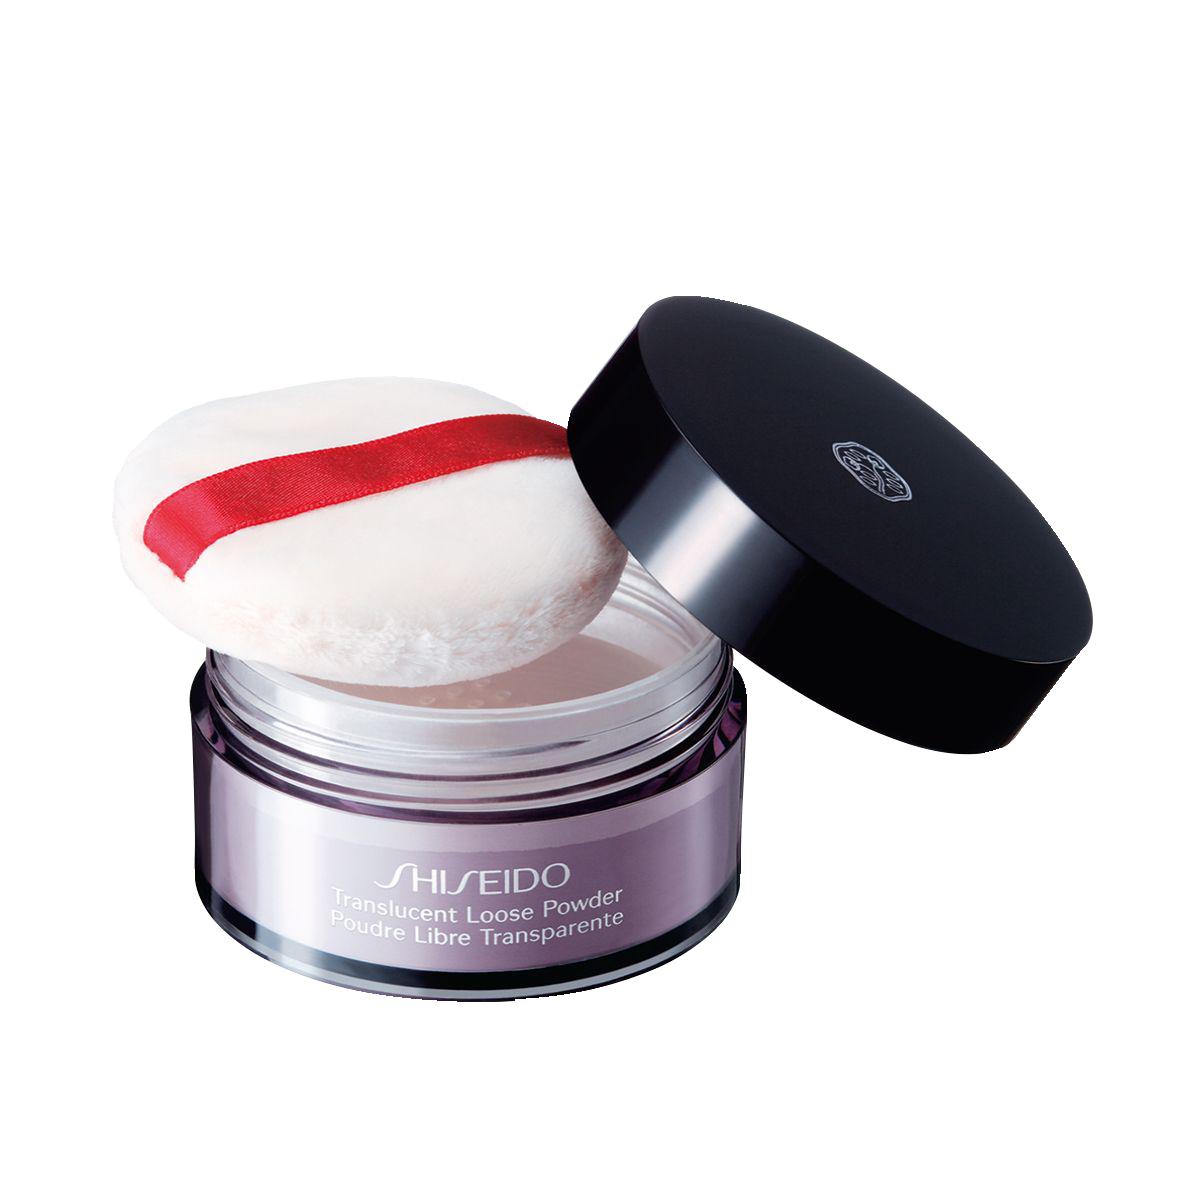 Phấn phủ cao cấp Translucent Loose Powder: